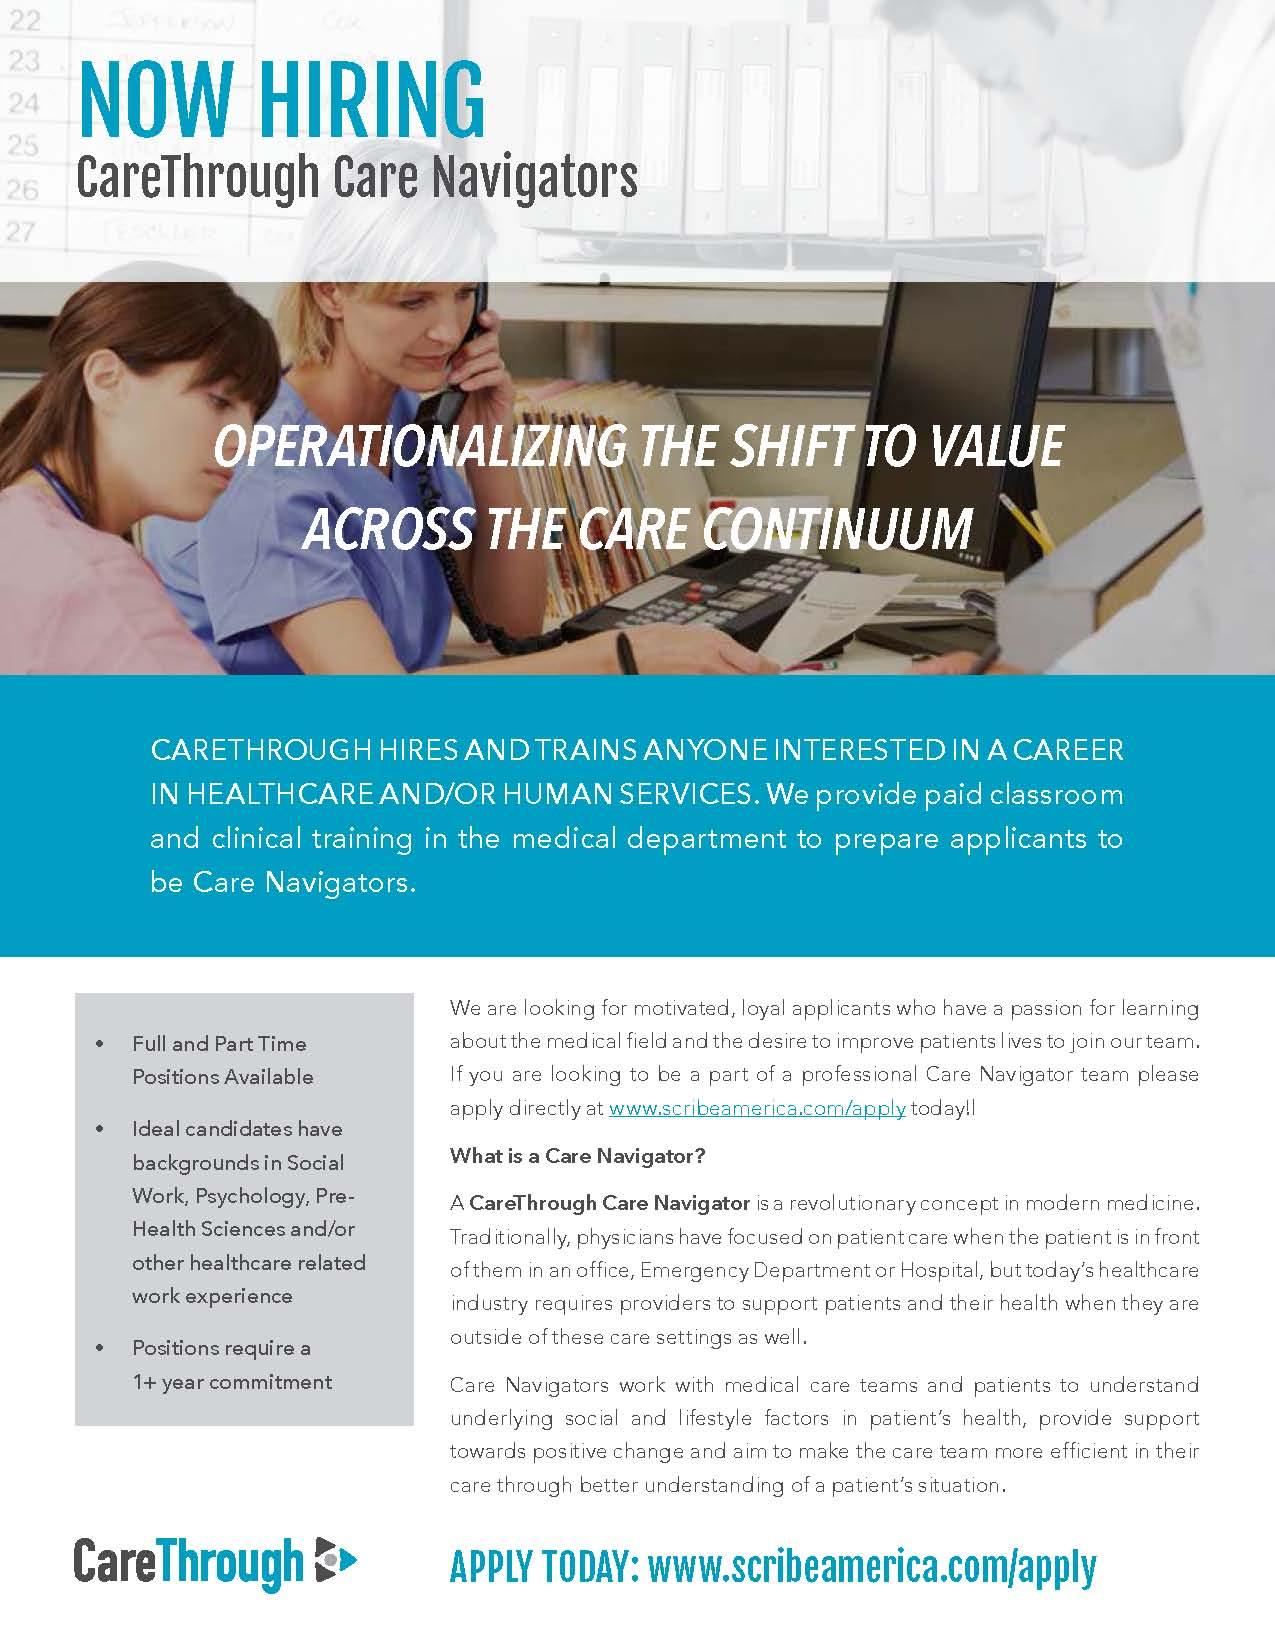 Care Through Hiring Care Navigators